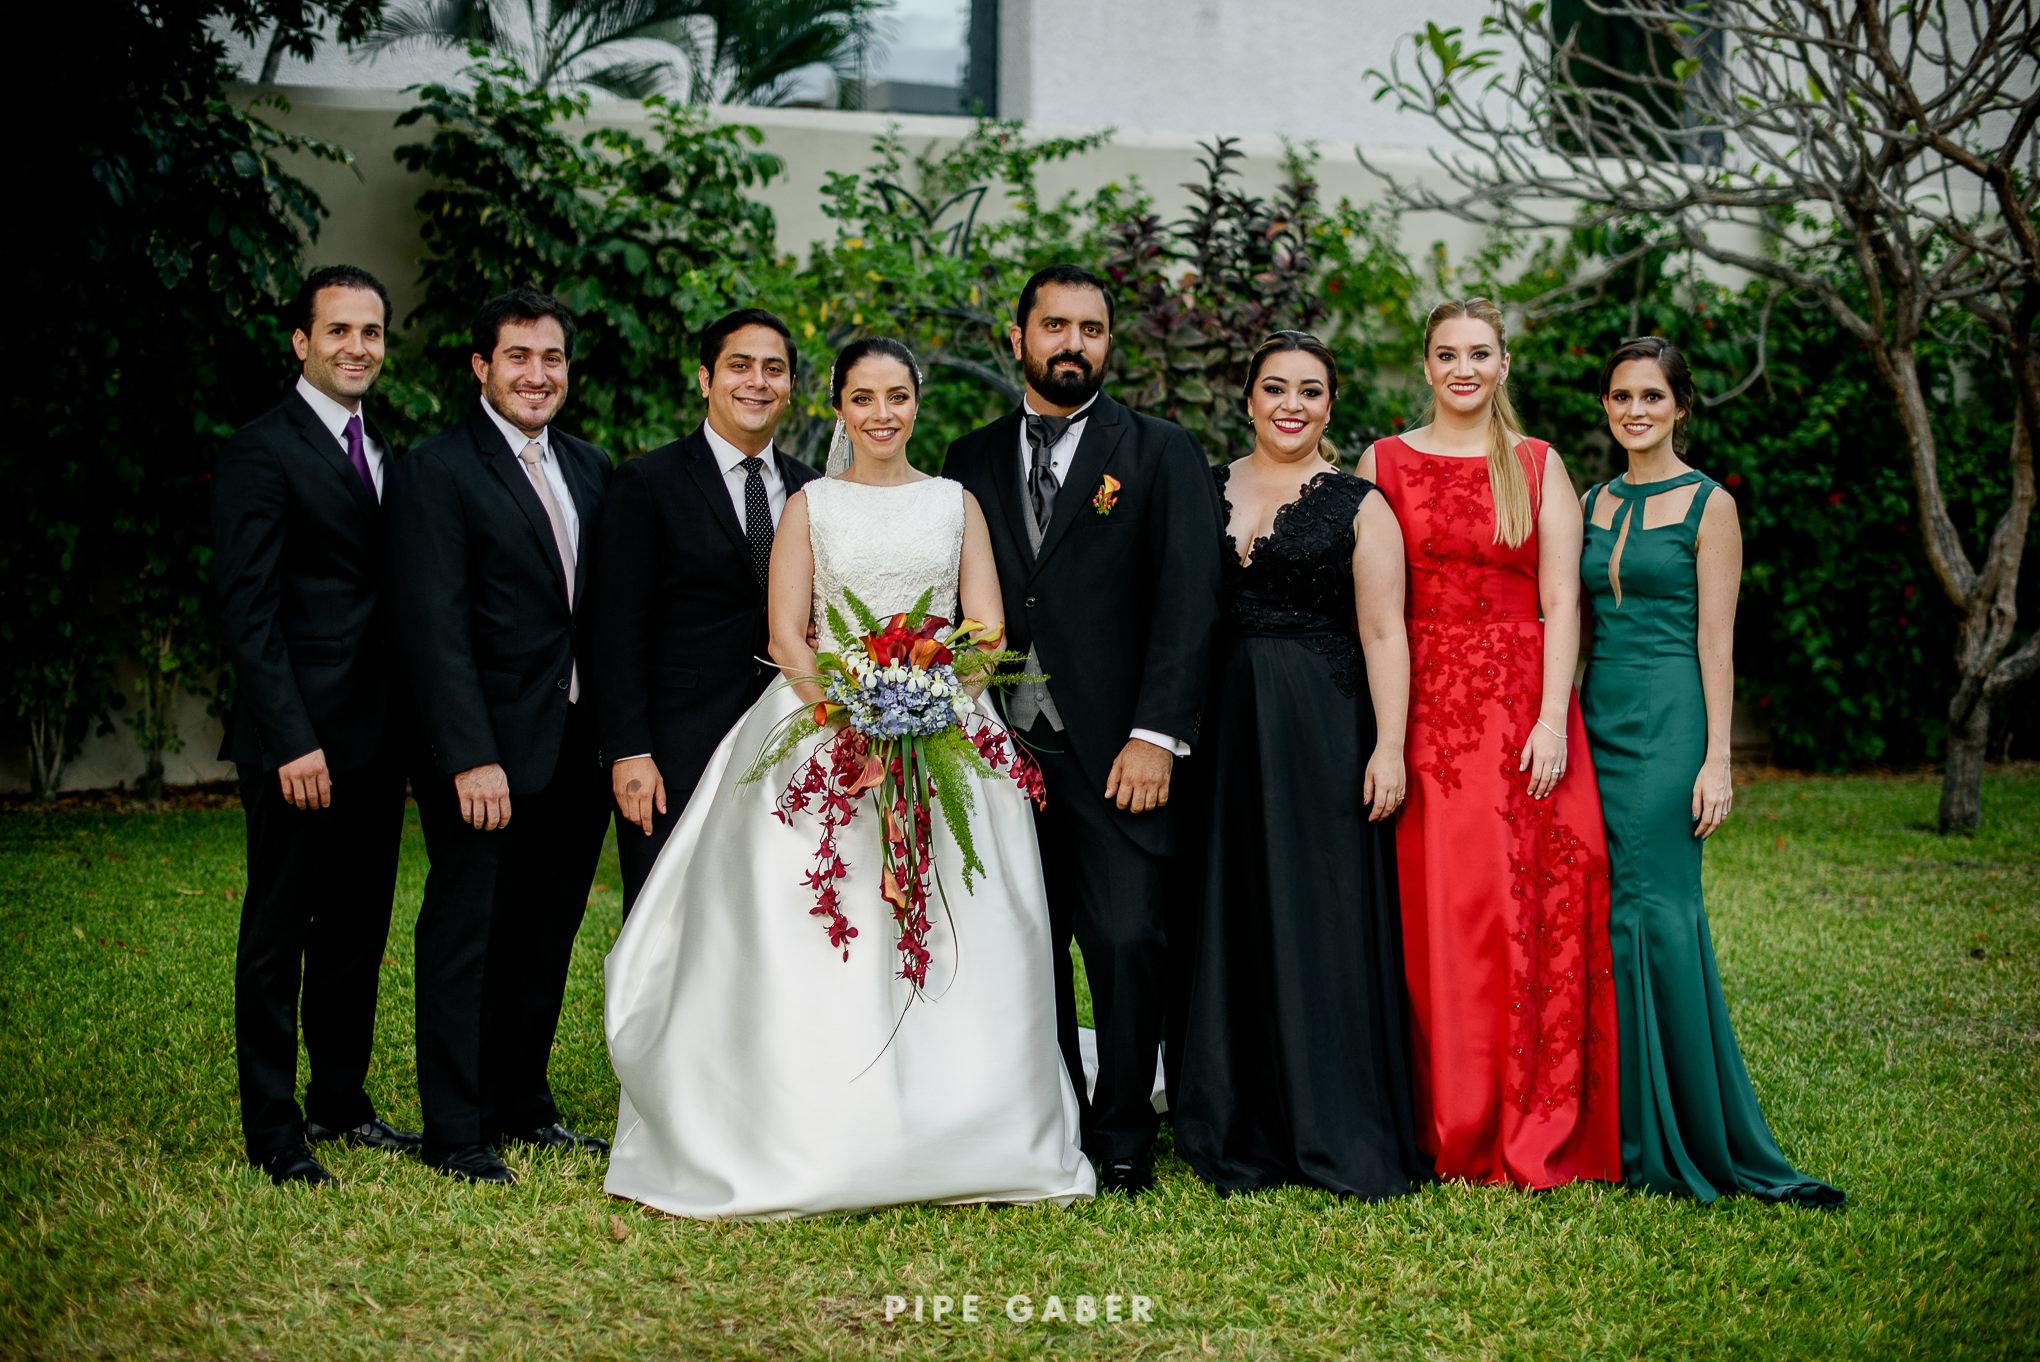 17_02_18_WEDDING_AIDITA_NEZBIT_MIGUEL_DOGRE_150_web.jpg